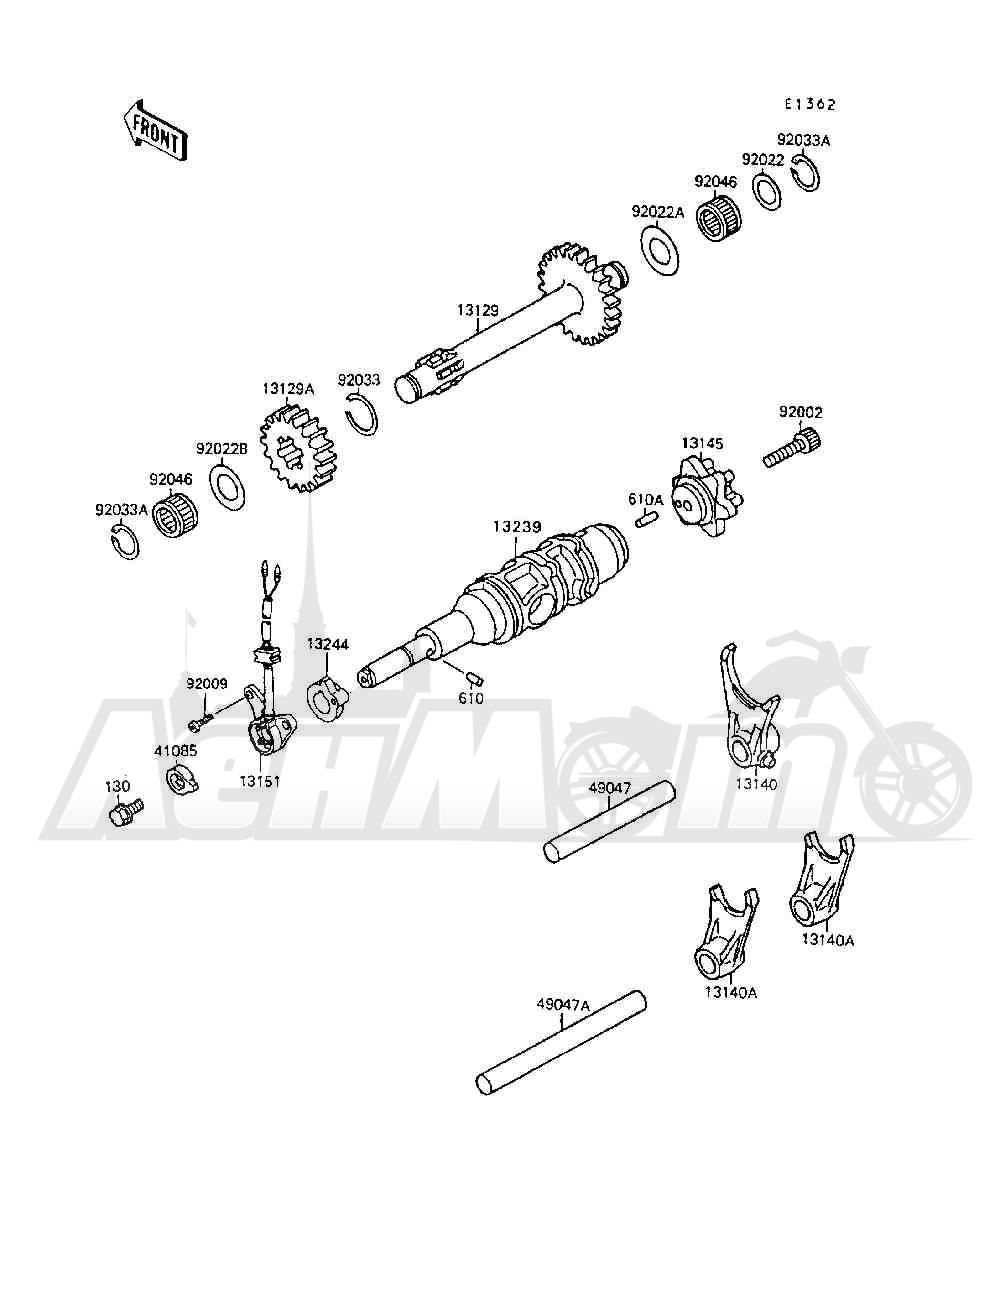 Запчасти для Квадроцикла Kawasaki 1994 MOJAVE 250 (KSF250-A8) Раздел: GEAR CHANGE DRUM / SHIFT FORK(S) | переключение передач барабан/вилка переключения (S)